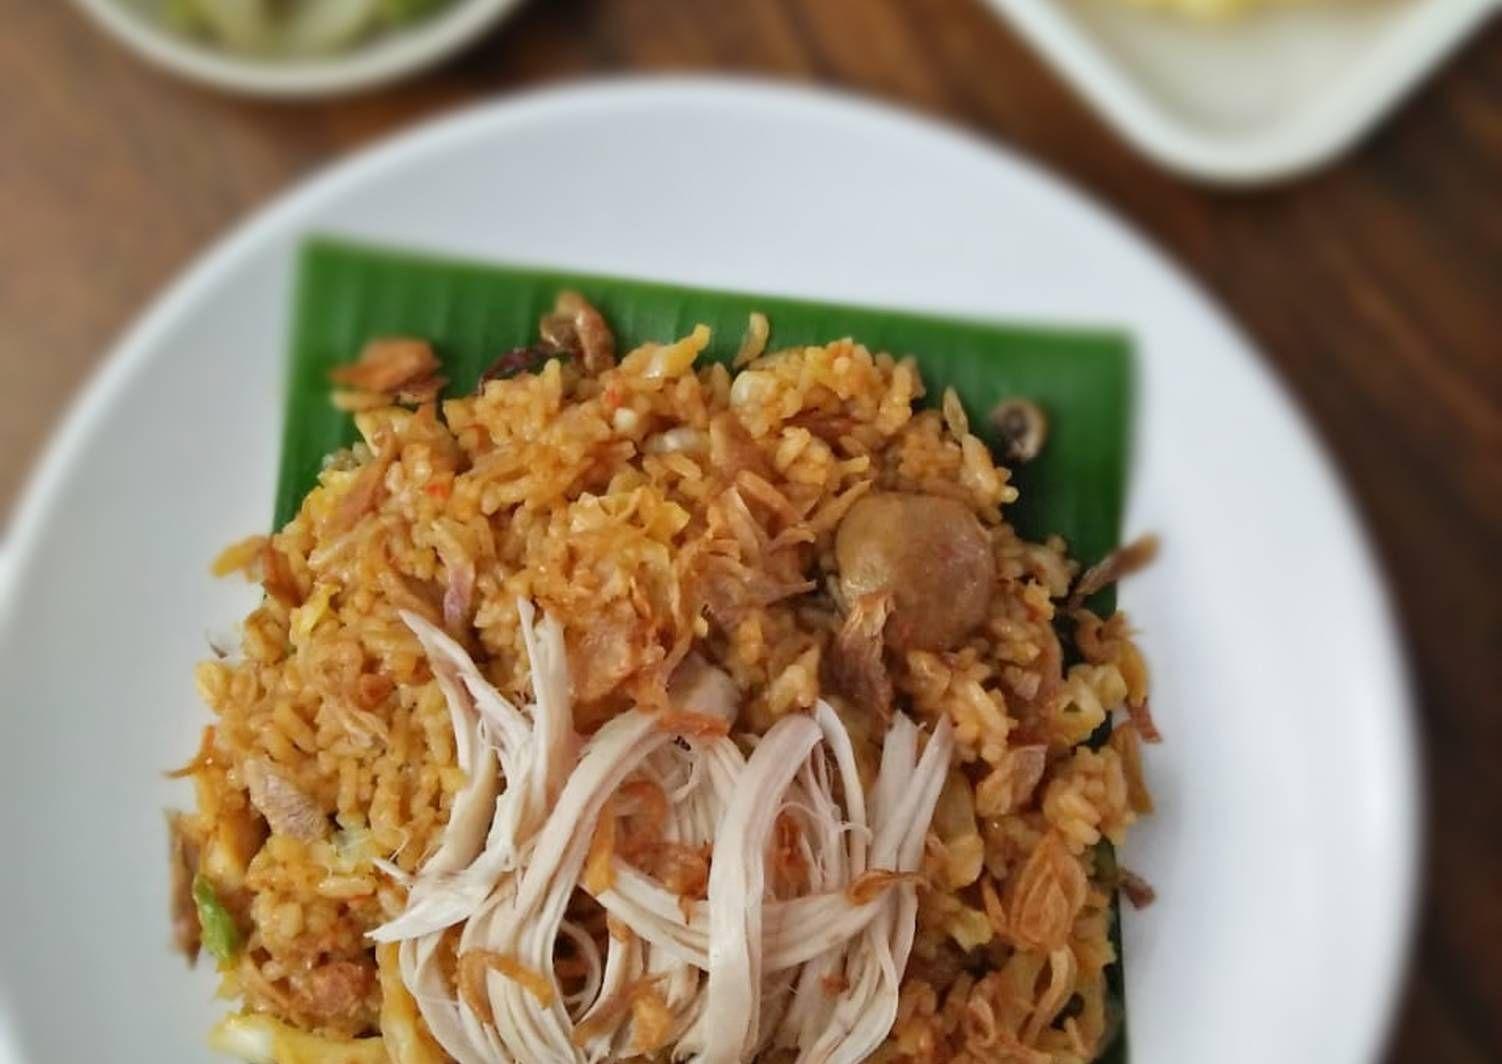 Resep Nasi Goreng Jawa Oleh Pitraratri Resep Masakan Nasi Goreng Resep